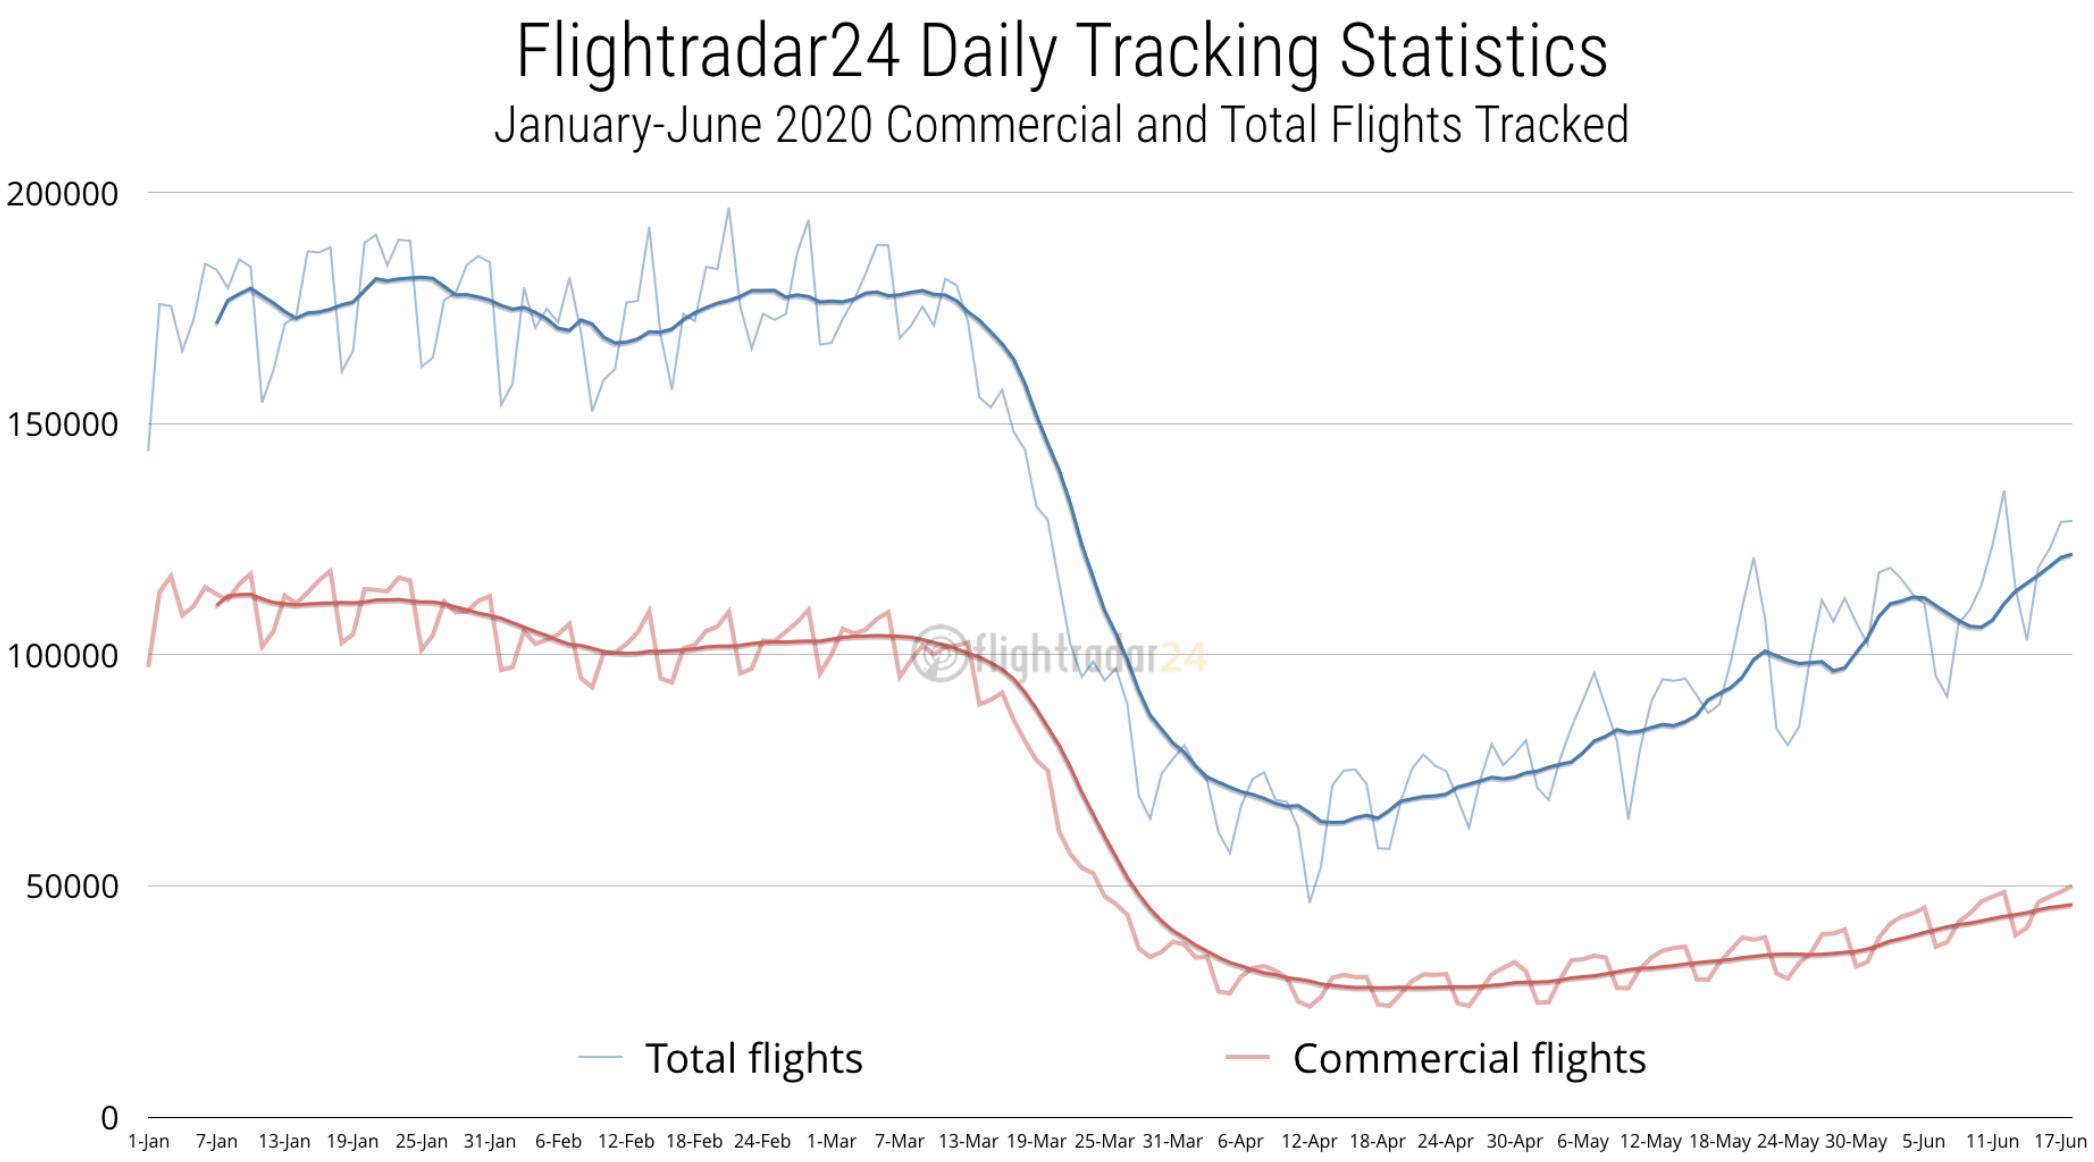 Commercial flight activity